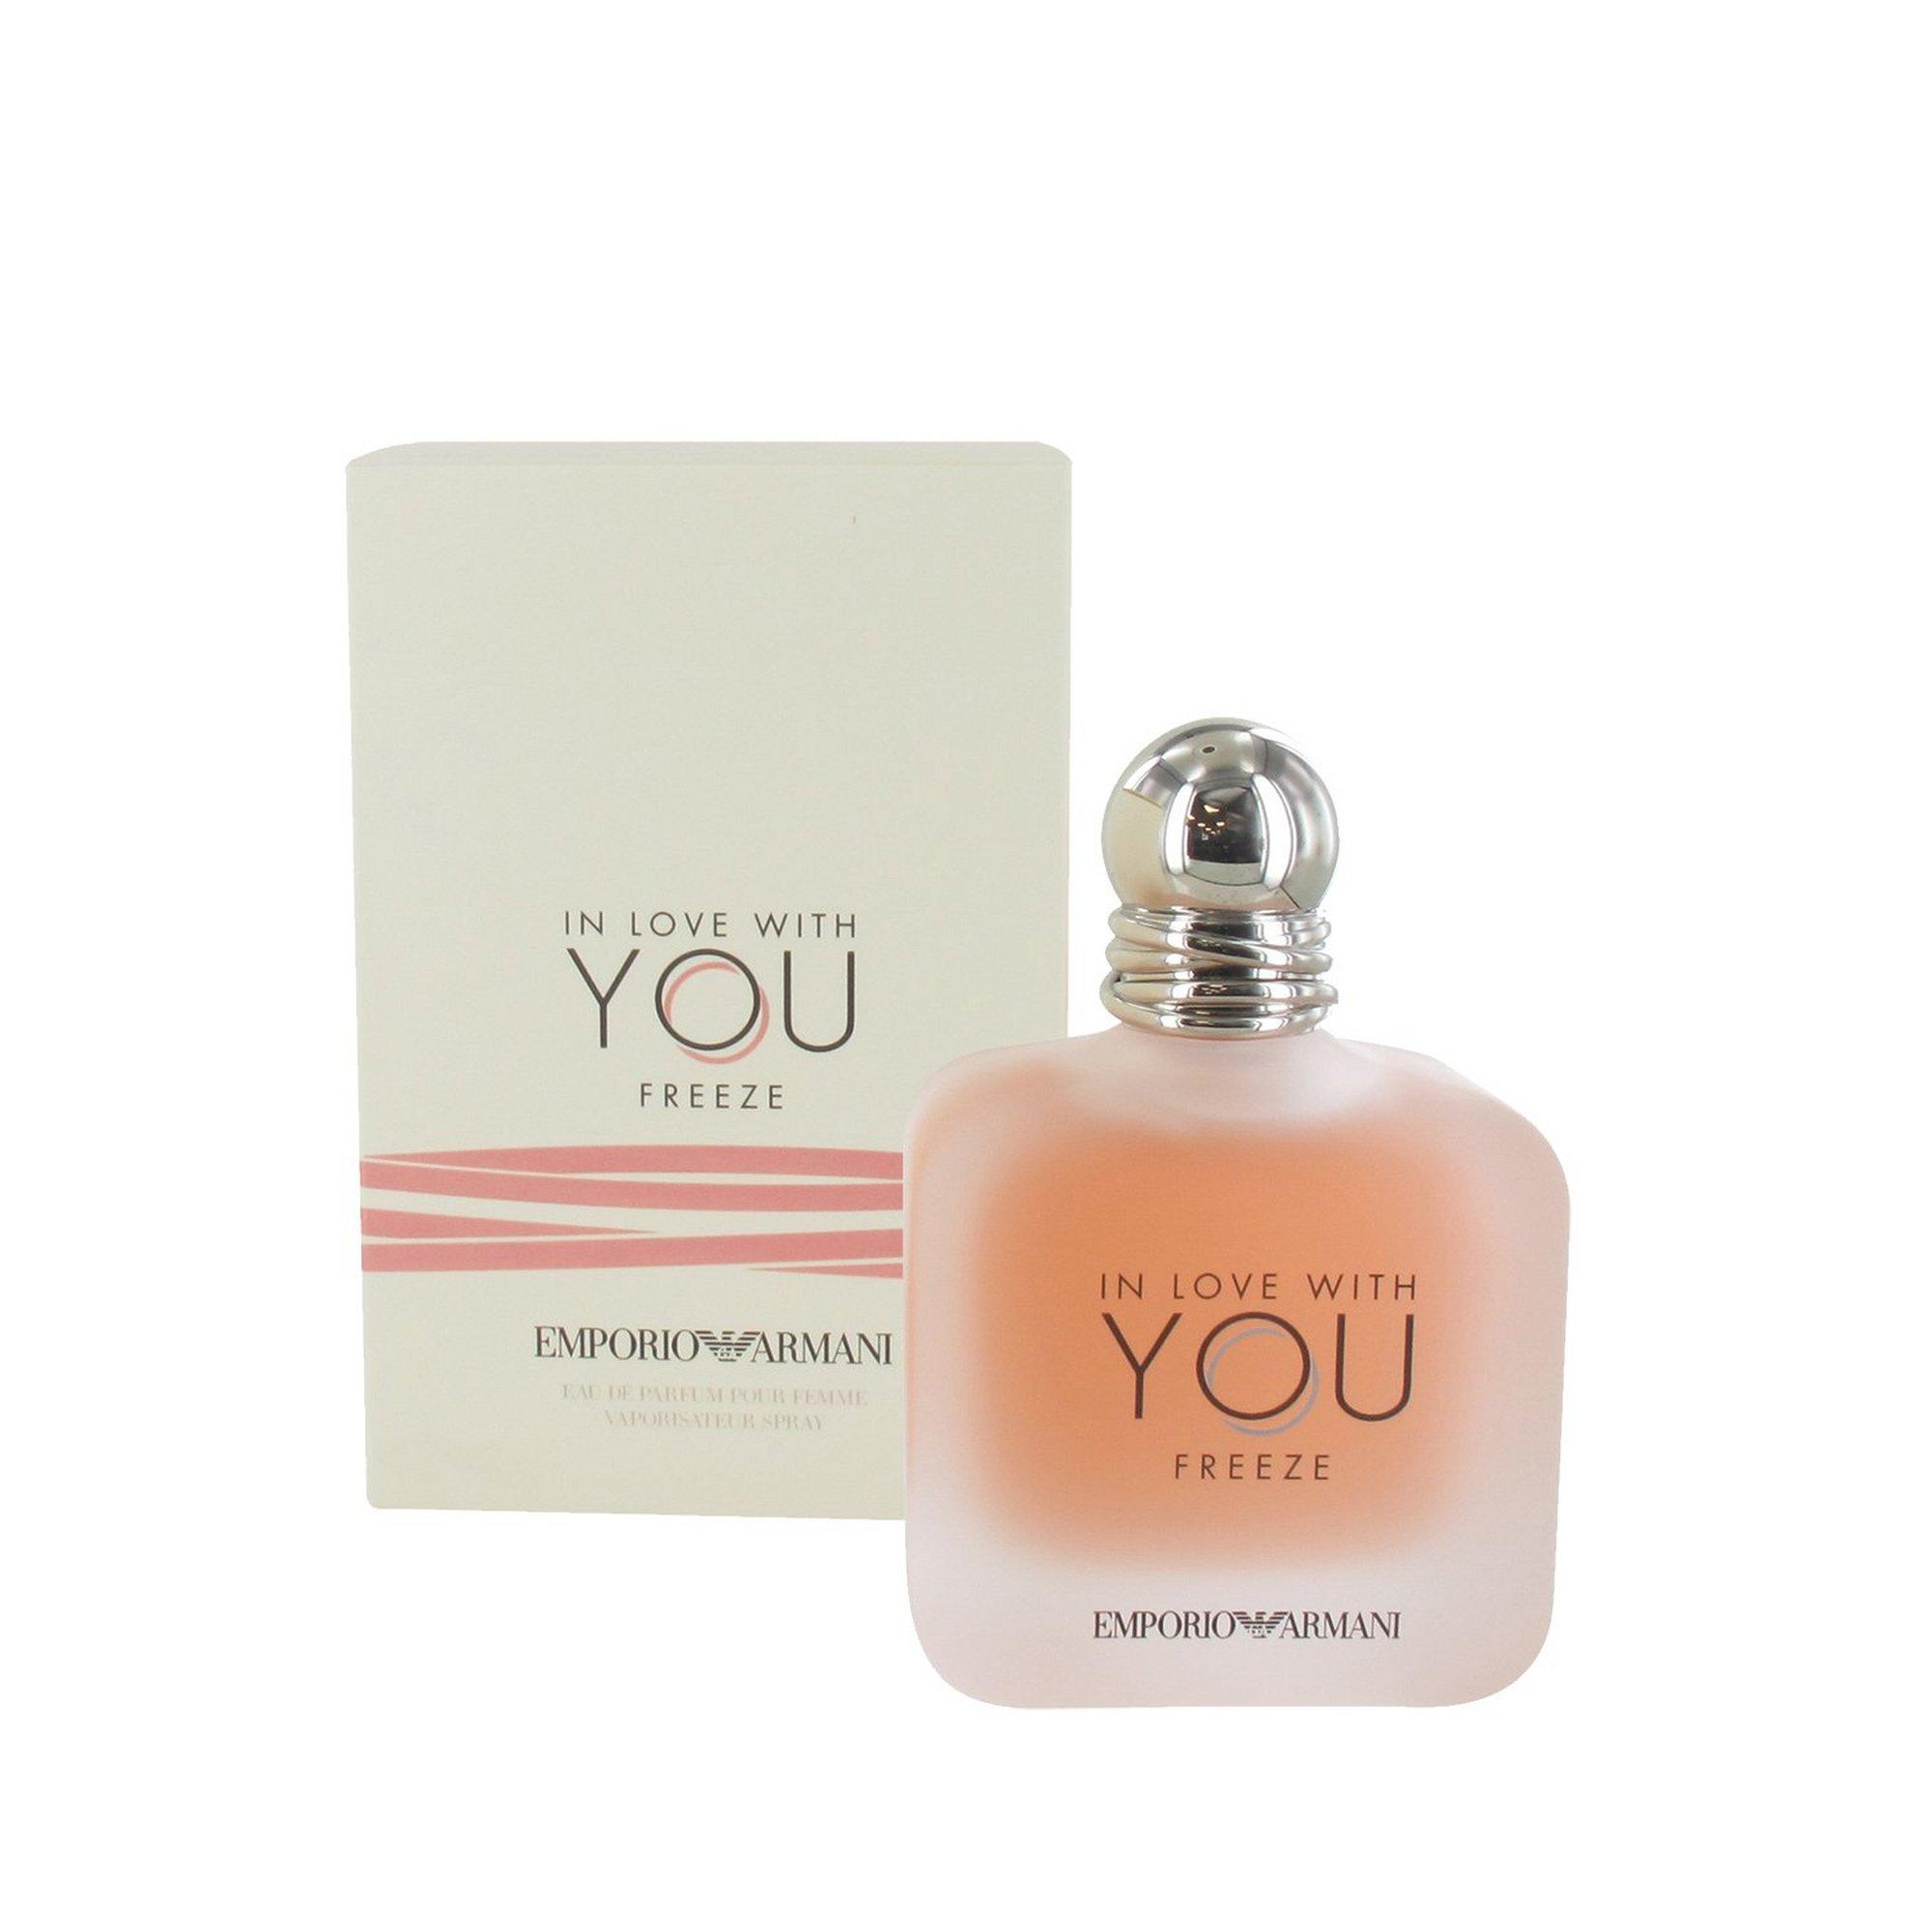 Image of Armani In Love With You Freeze 100ml Eau de Parfum